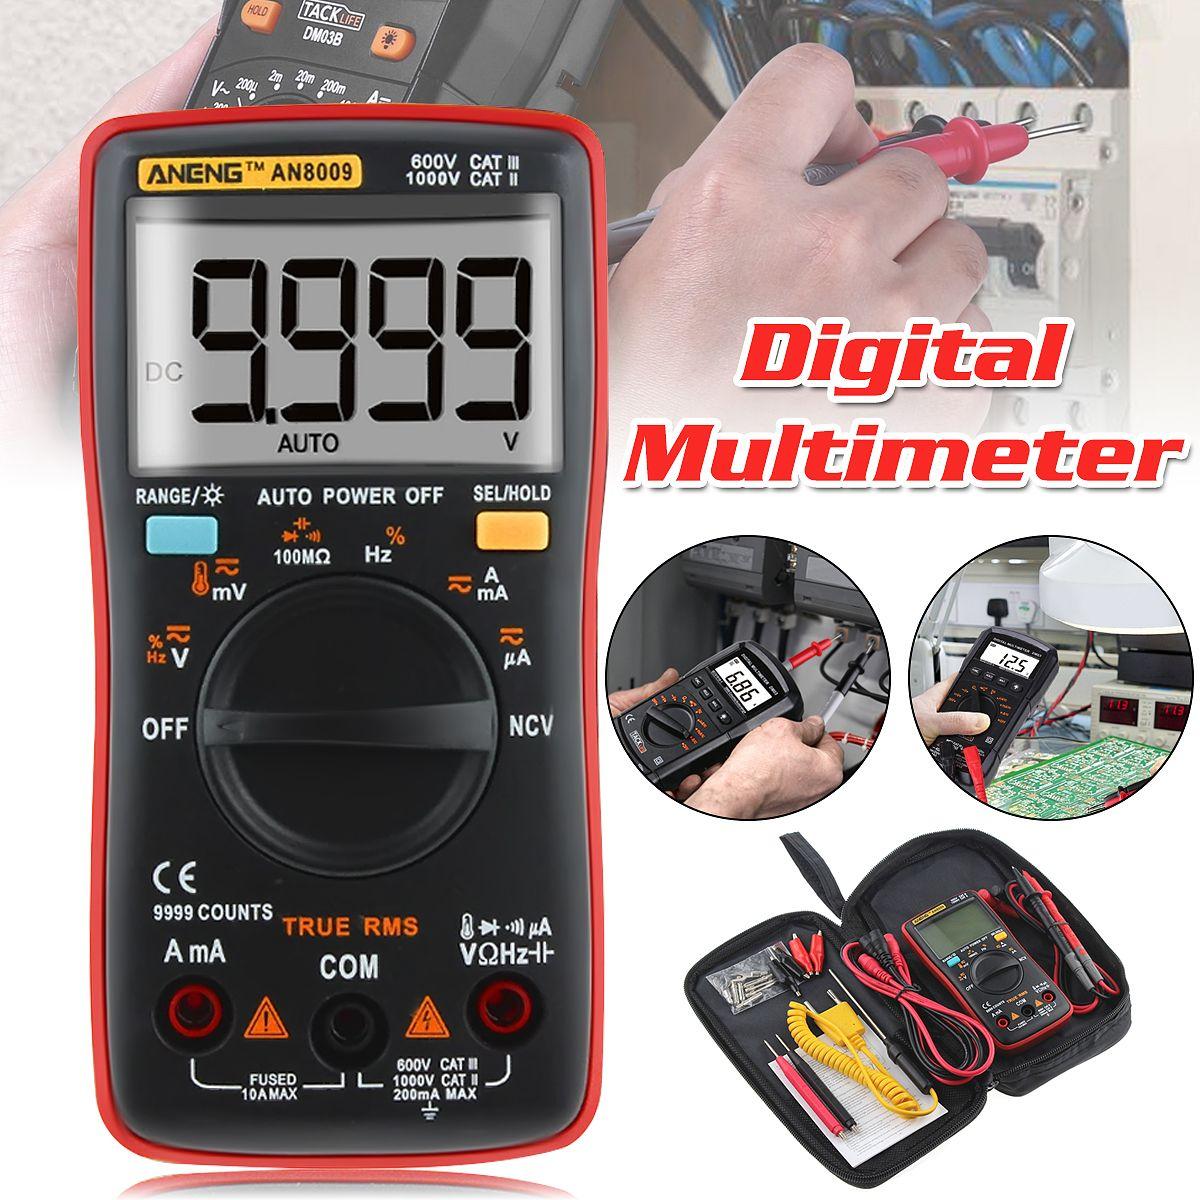 ANENG AN8009 Digital Multimeter True RMS NCV Backlight Ammeter Voltmeter Auto Range 9999 Counts AC/DC Current